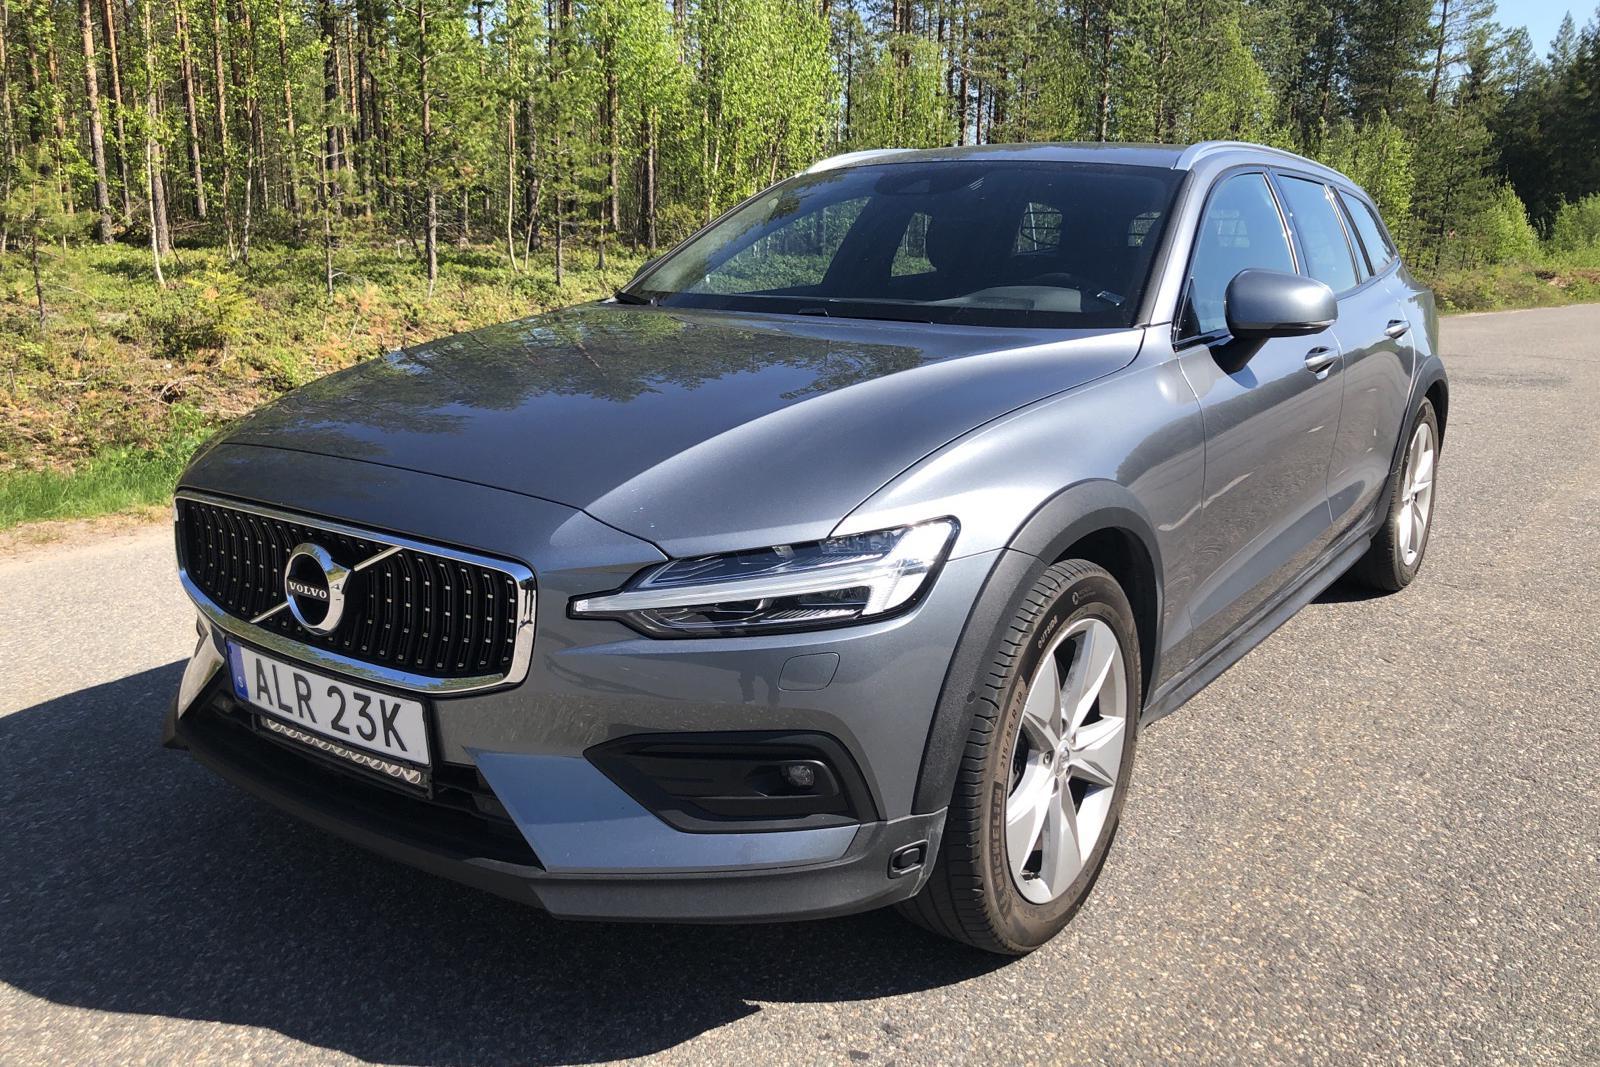 Volvo V60 D4 Cross Country AWD (190hk) - 20 340 km - Automatic - gray - 2019